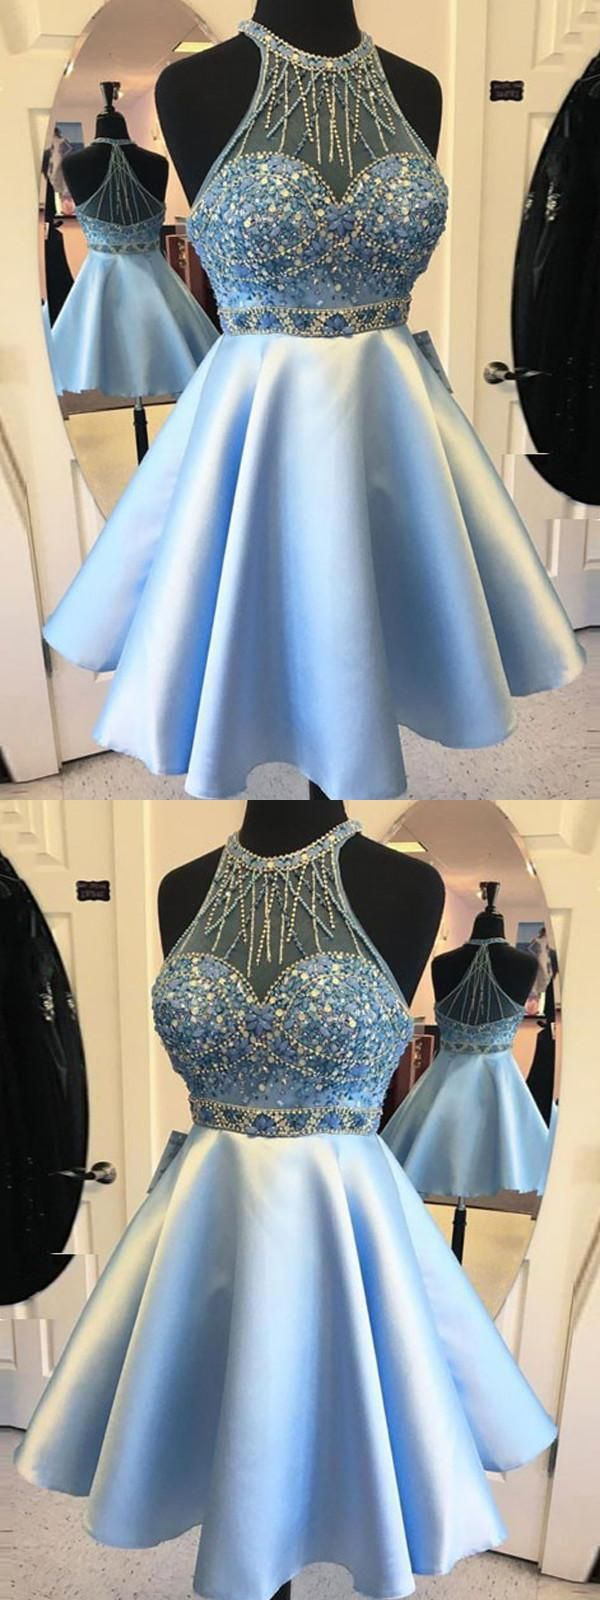 Aline homecoming dresses alinehomecomingdresses homecoming